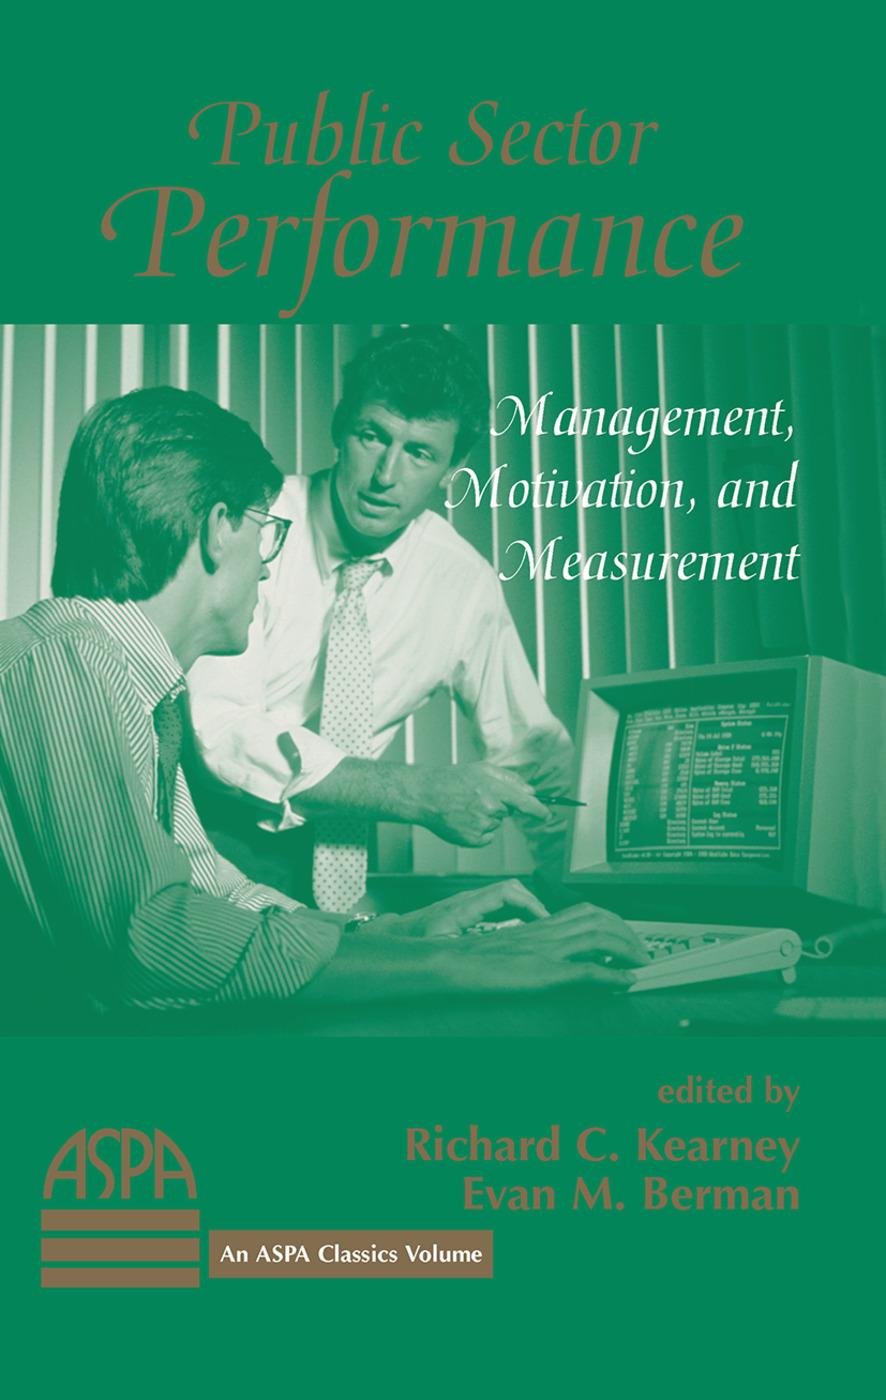 Public Sector Performance: Management, Motivation, And Measurement book cover